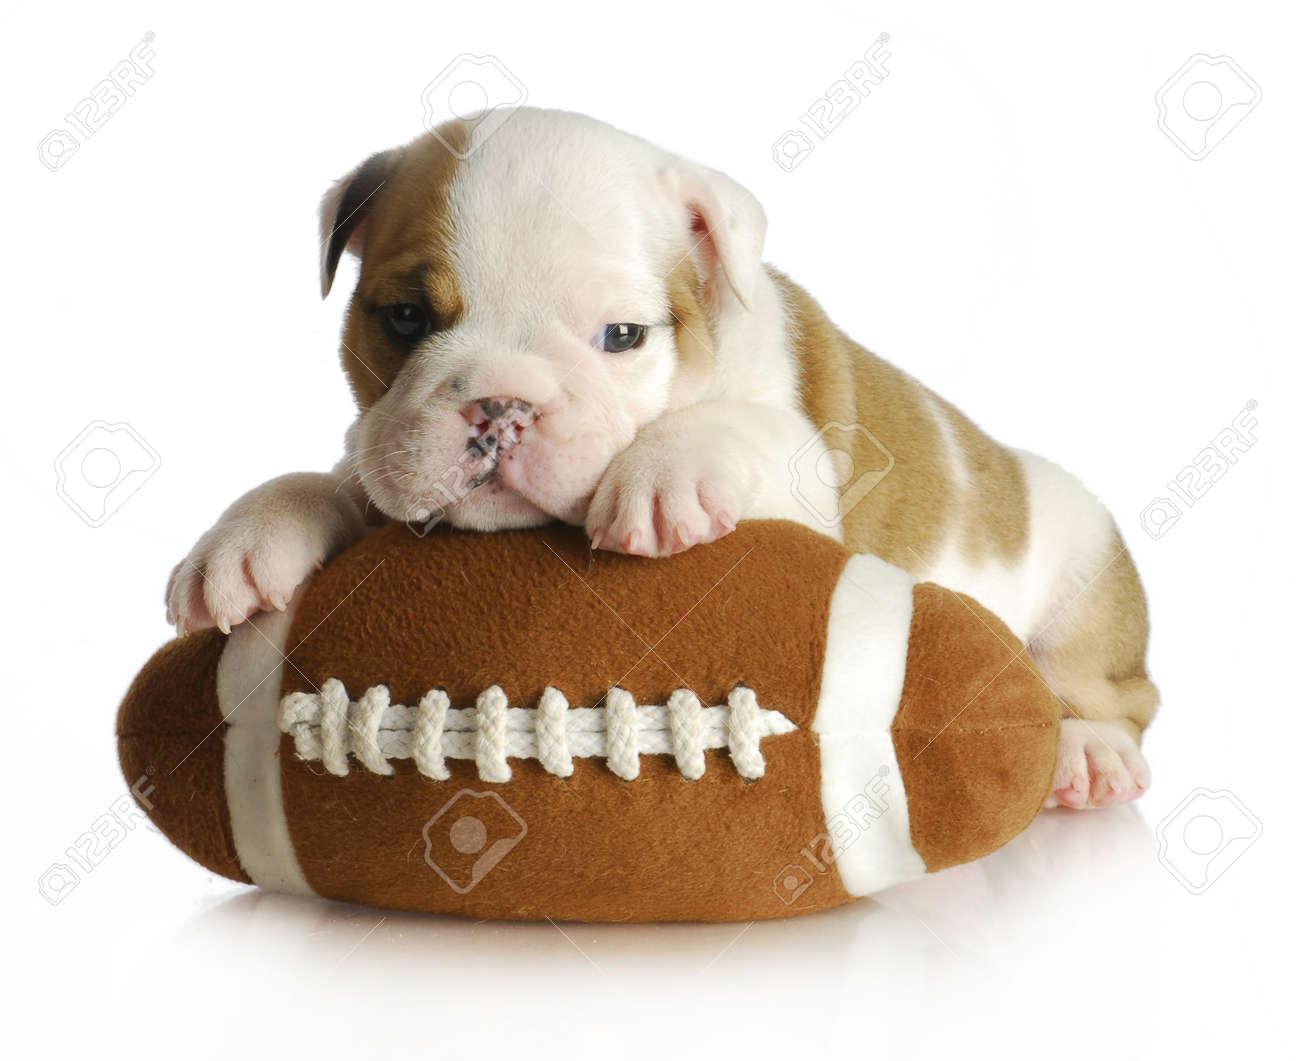 Must see Bulldog Ball Adorable Dog - 14036908-cute-puppy-with-stuffed-football-english-bulldog-5-weeks-old  Image_146558  .jpg